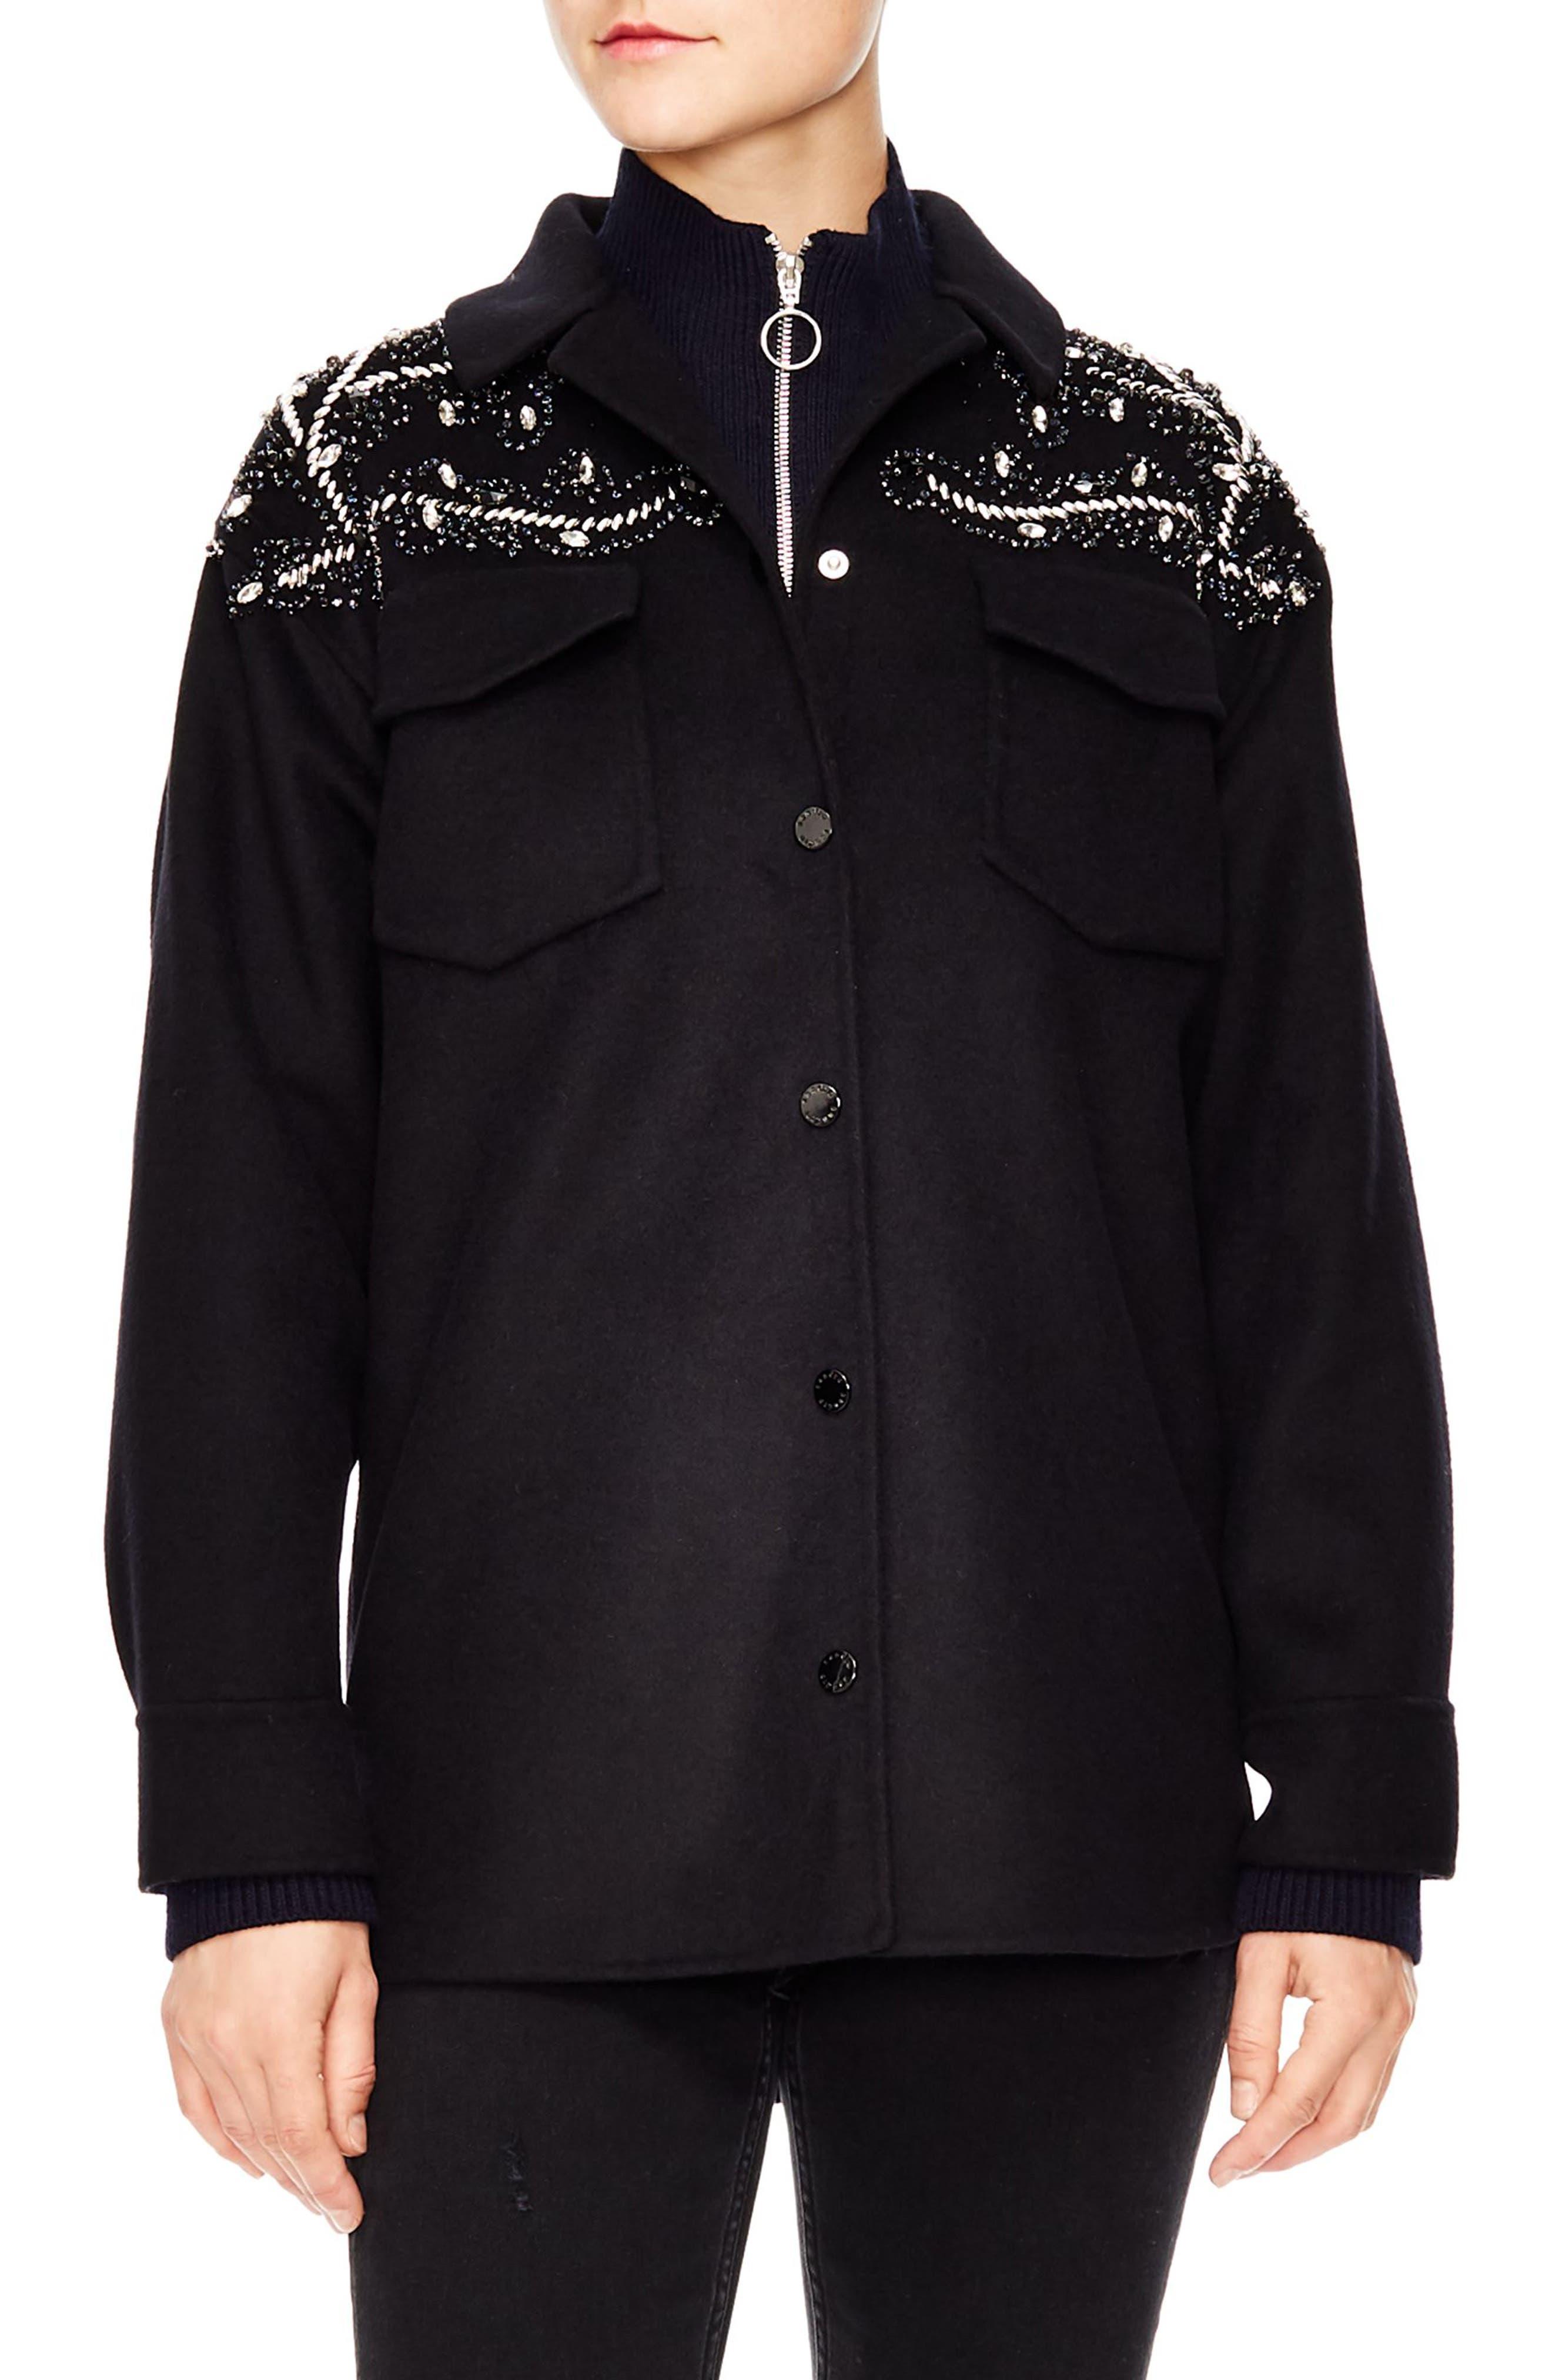 Saille Jacket,                             Main thumbnail 1, color,                             BLACK